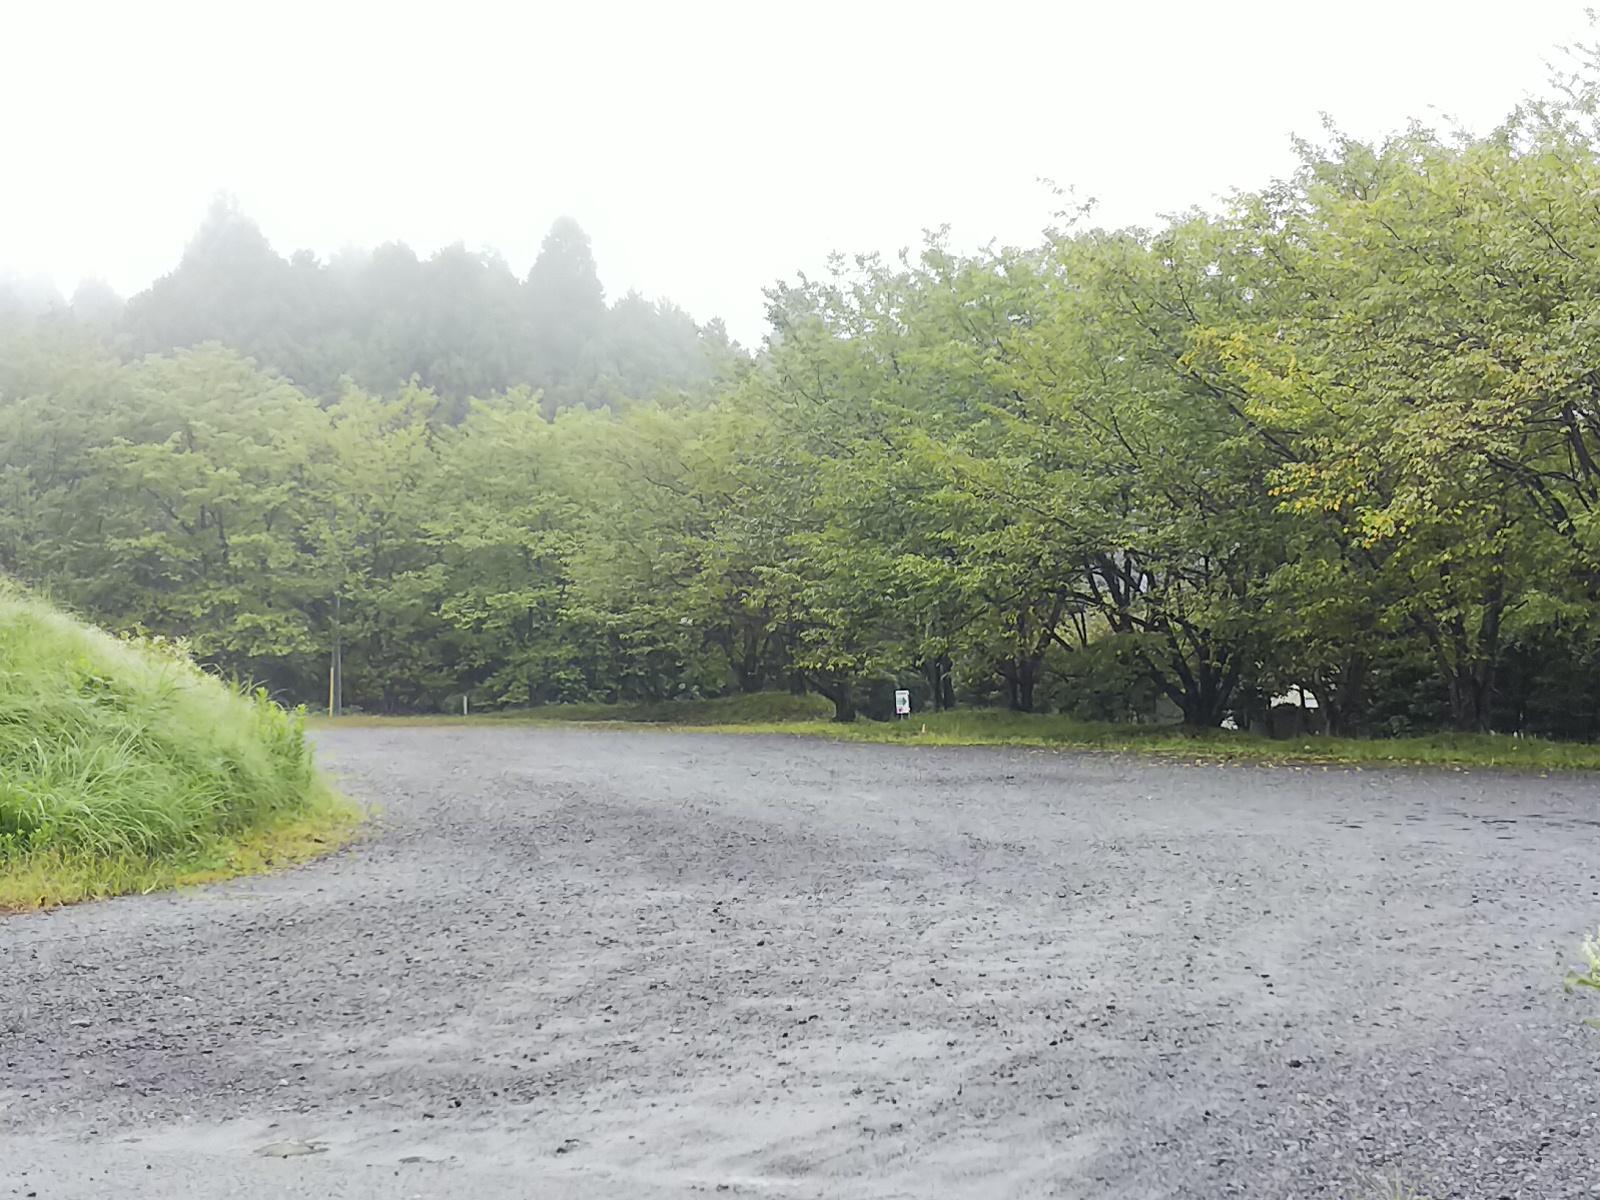 http://www.cyclomotohara.com/information/images/DSC_2414.JPG